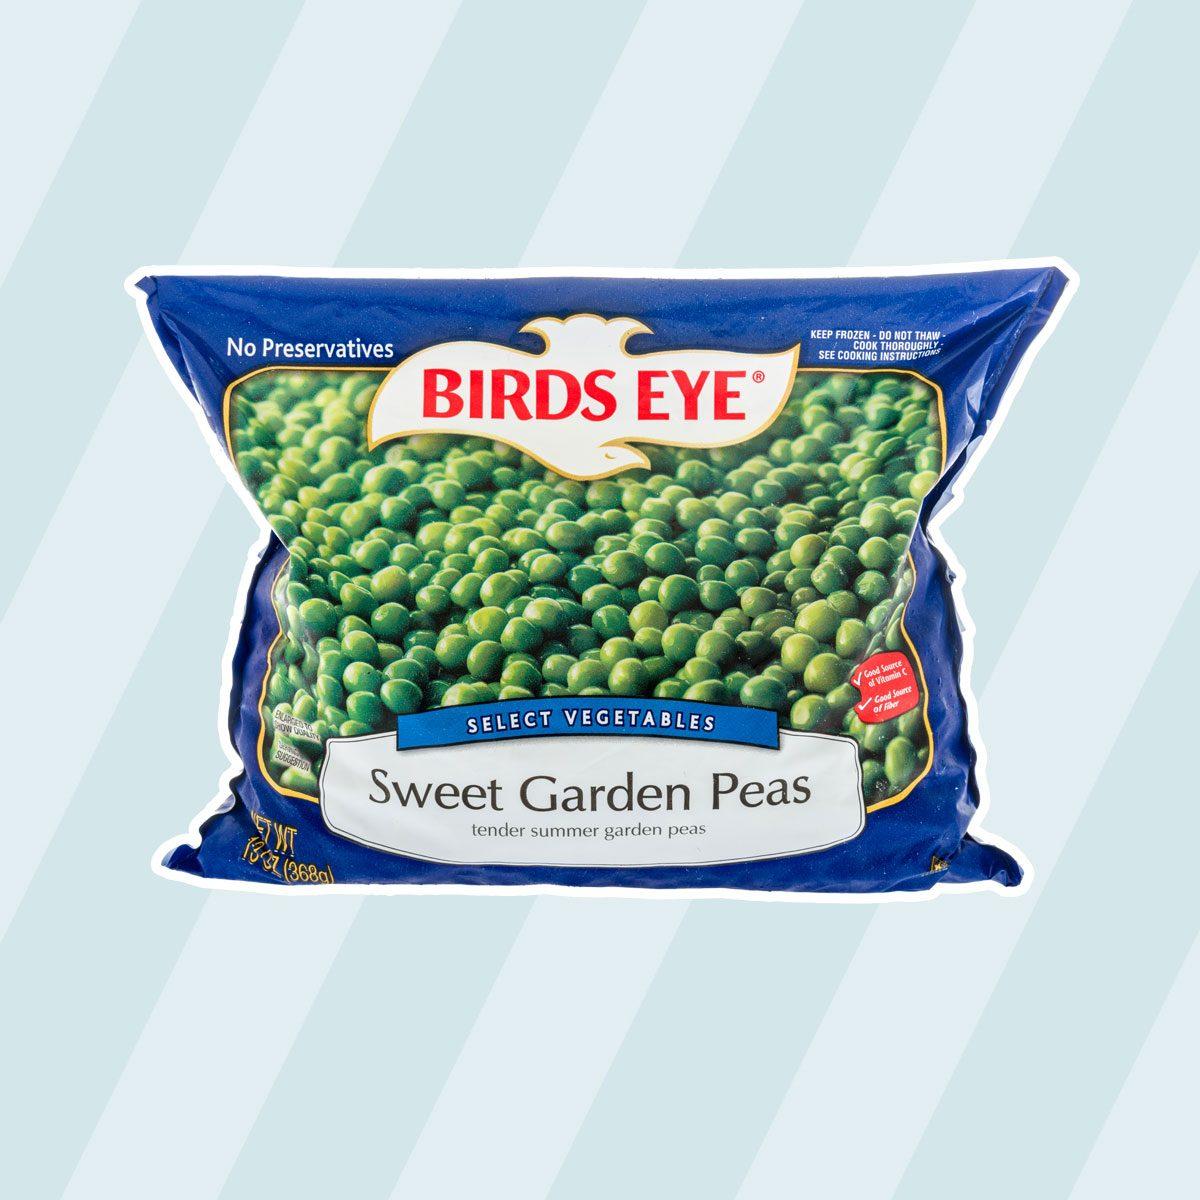 Birds Eye frozen peas